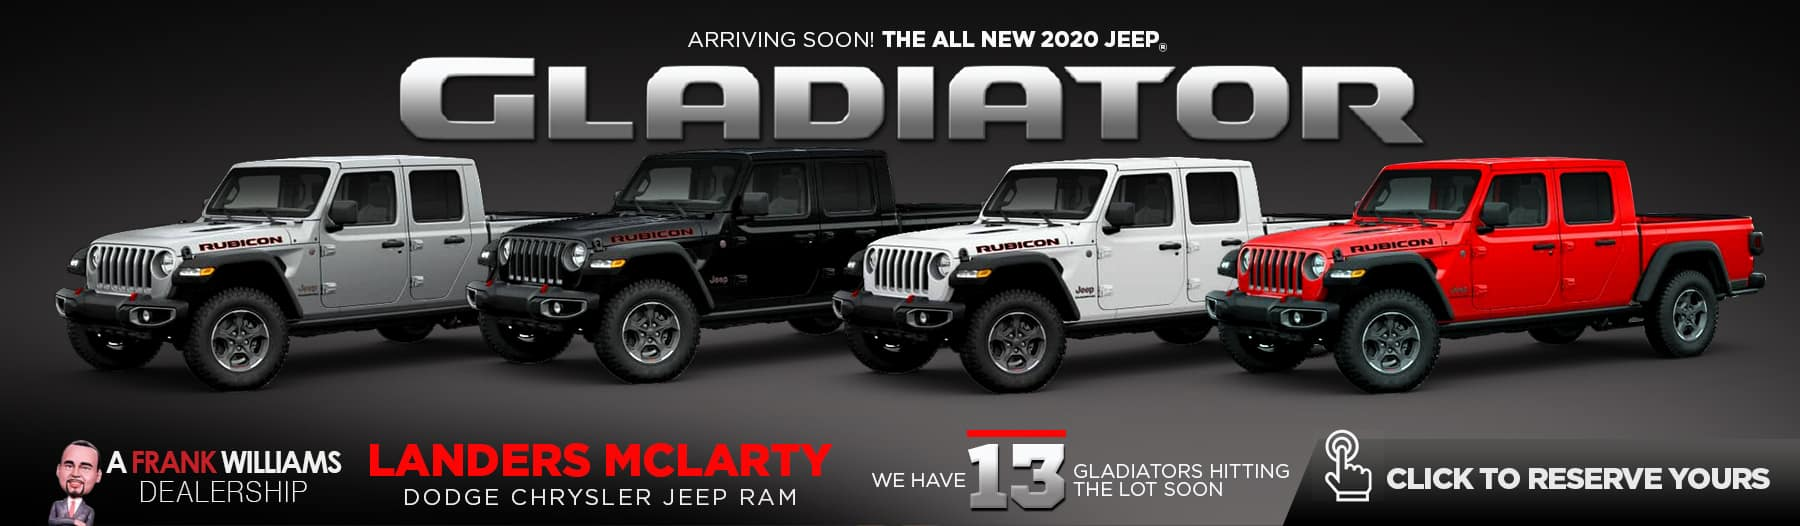 Landers McLarty Dodge Chrysler Jeep Ram Dealership